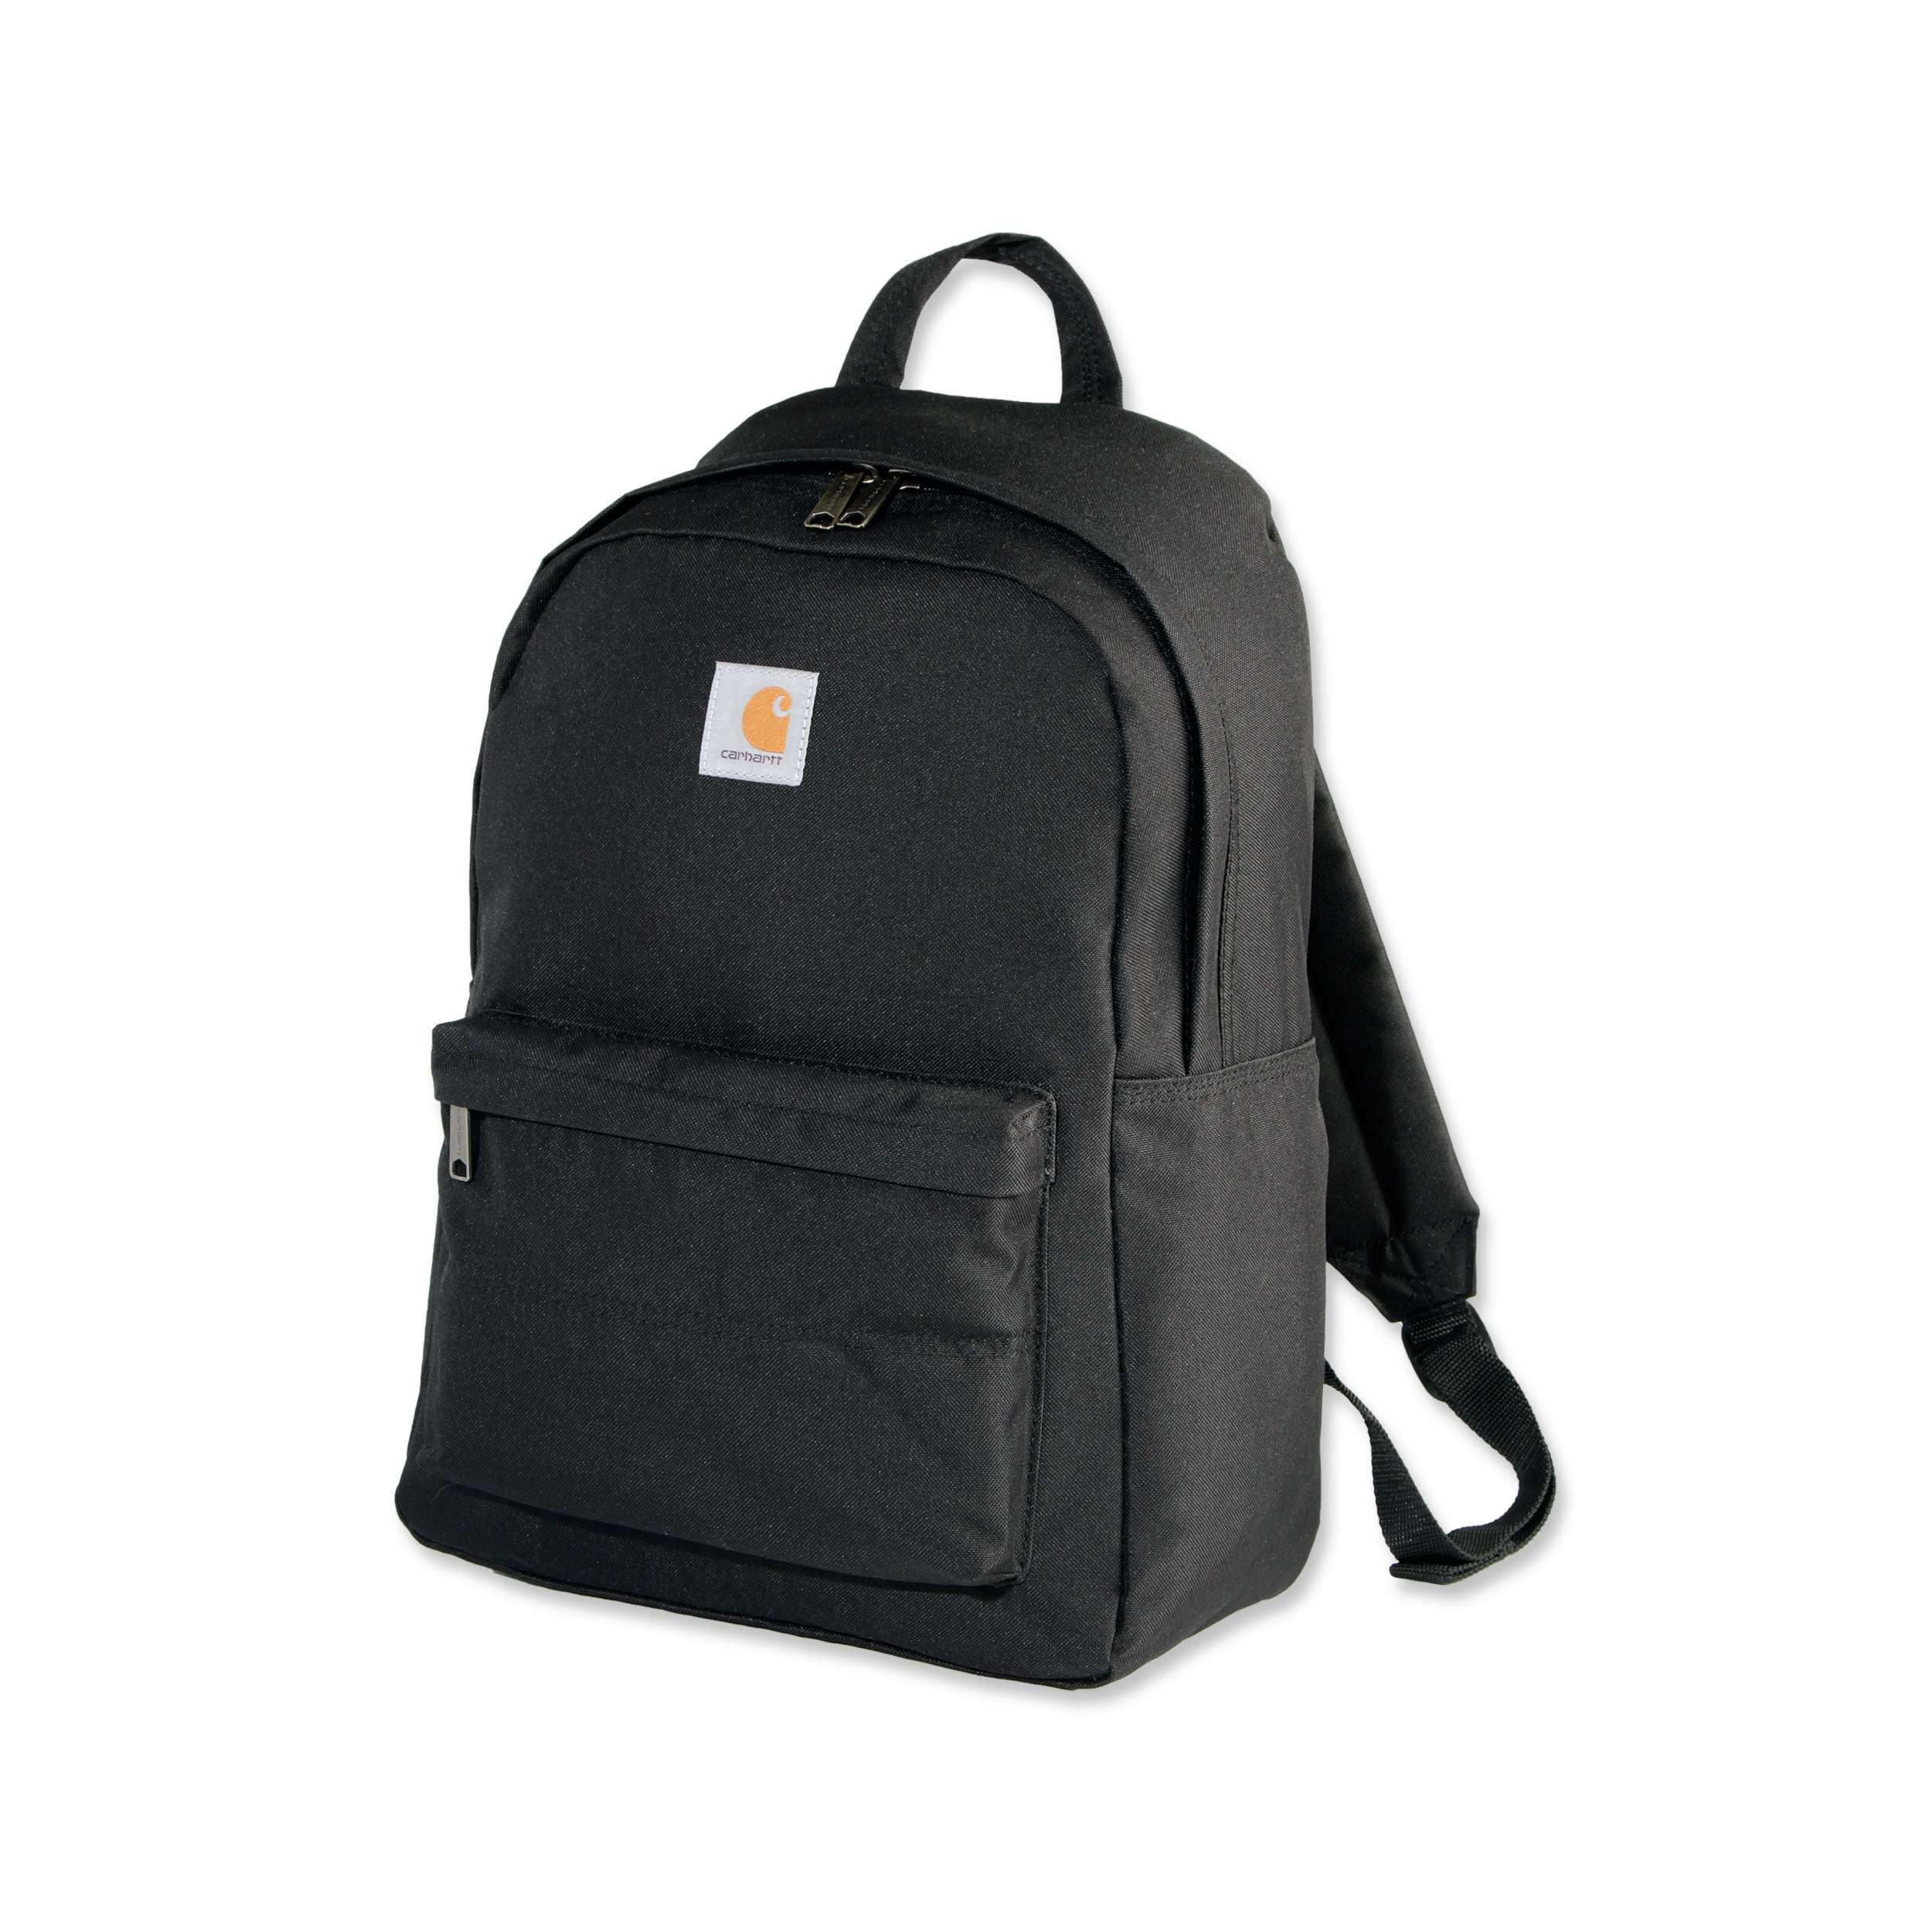 Рюкзак Carhartt Trade Backpack - 100301B (Black, OFA)